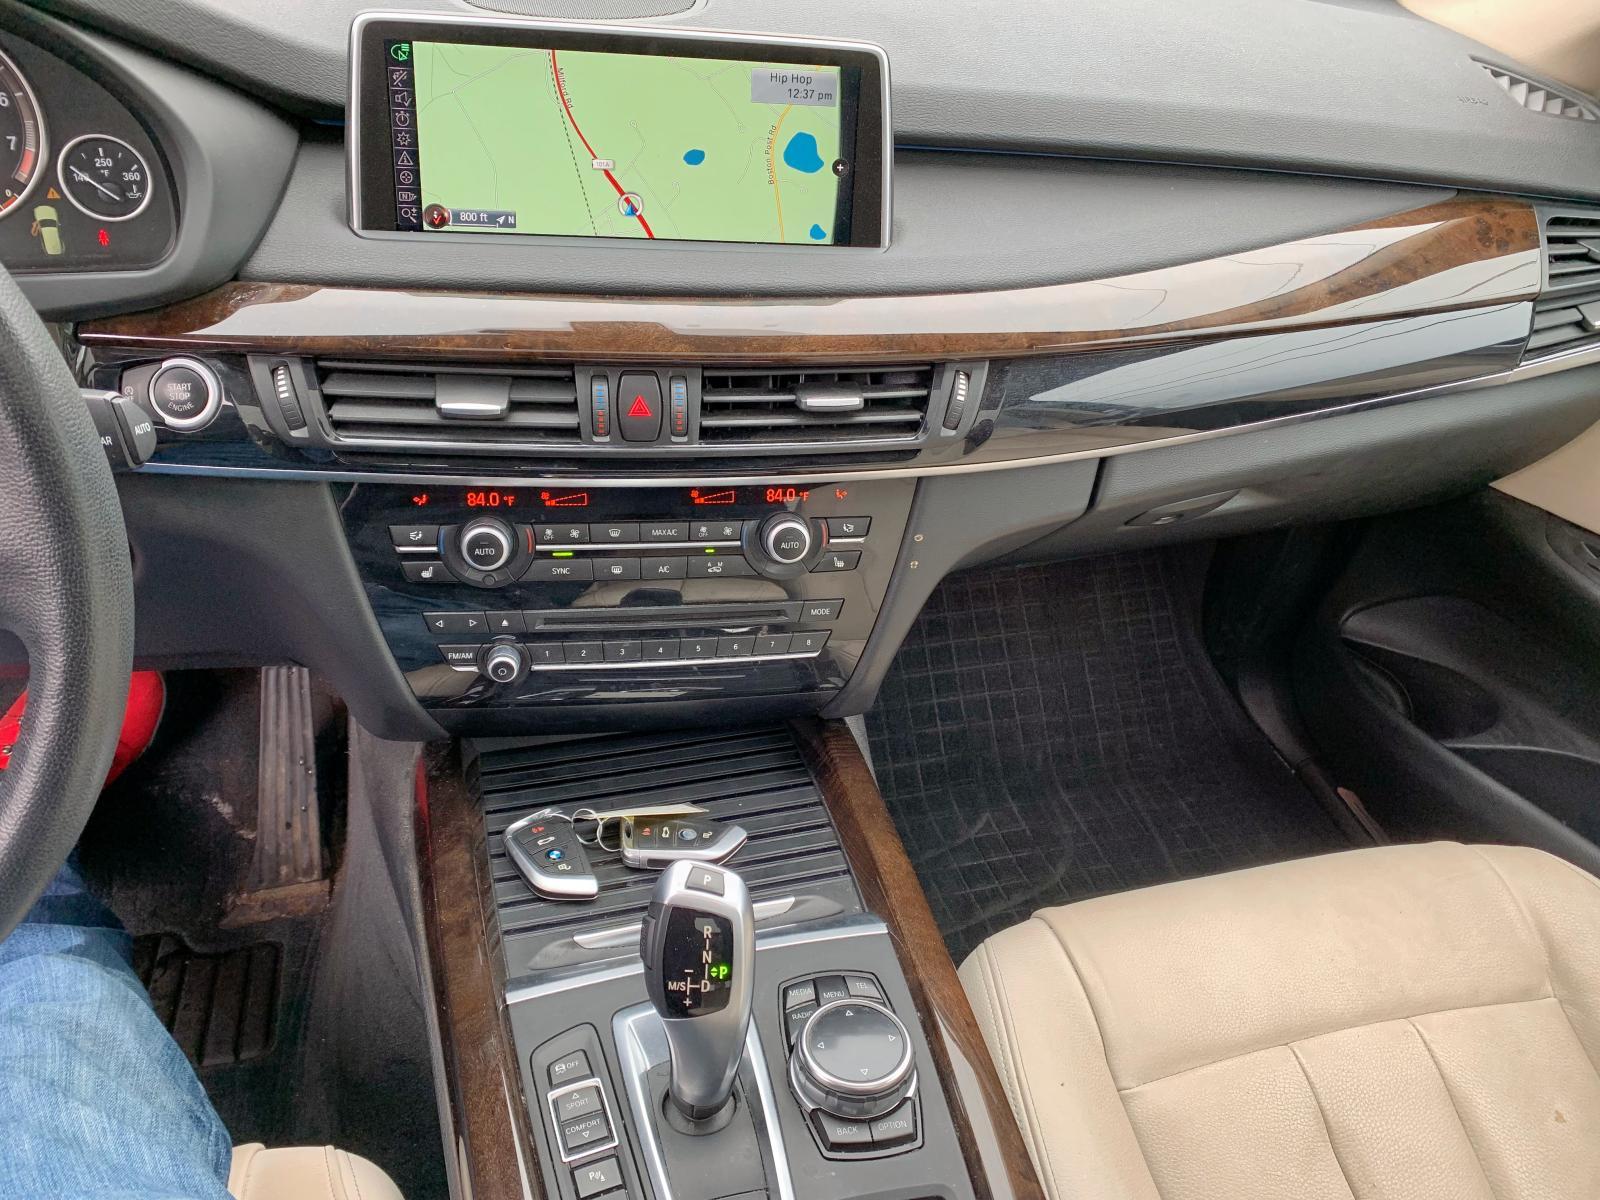 5UXKR0C58E0H25201 - 2014 Bmw X5 Xdrive3 3.0L engine view